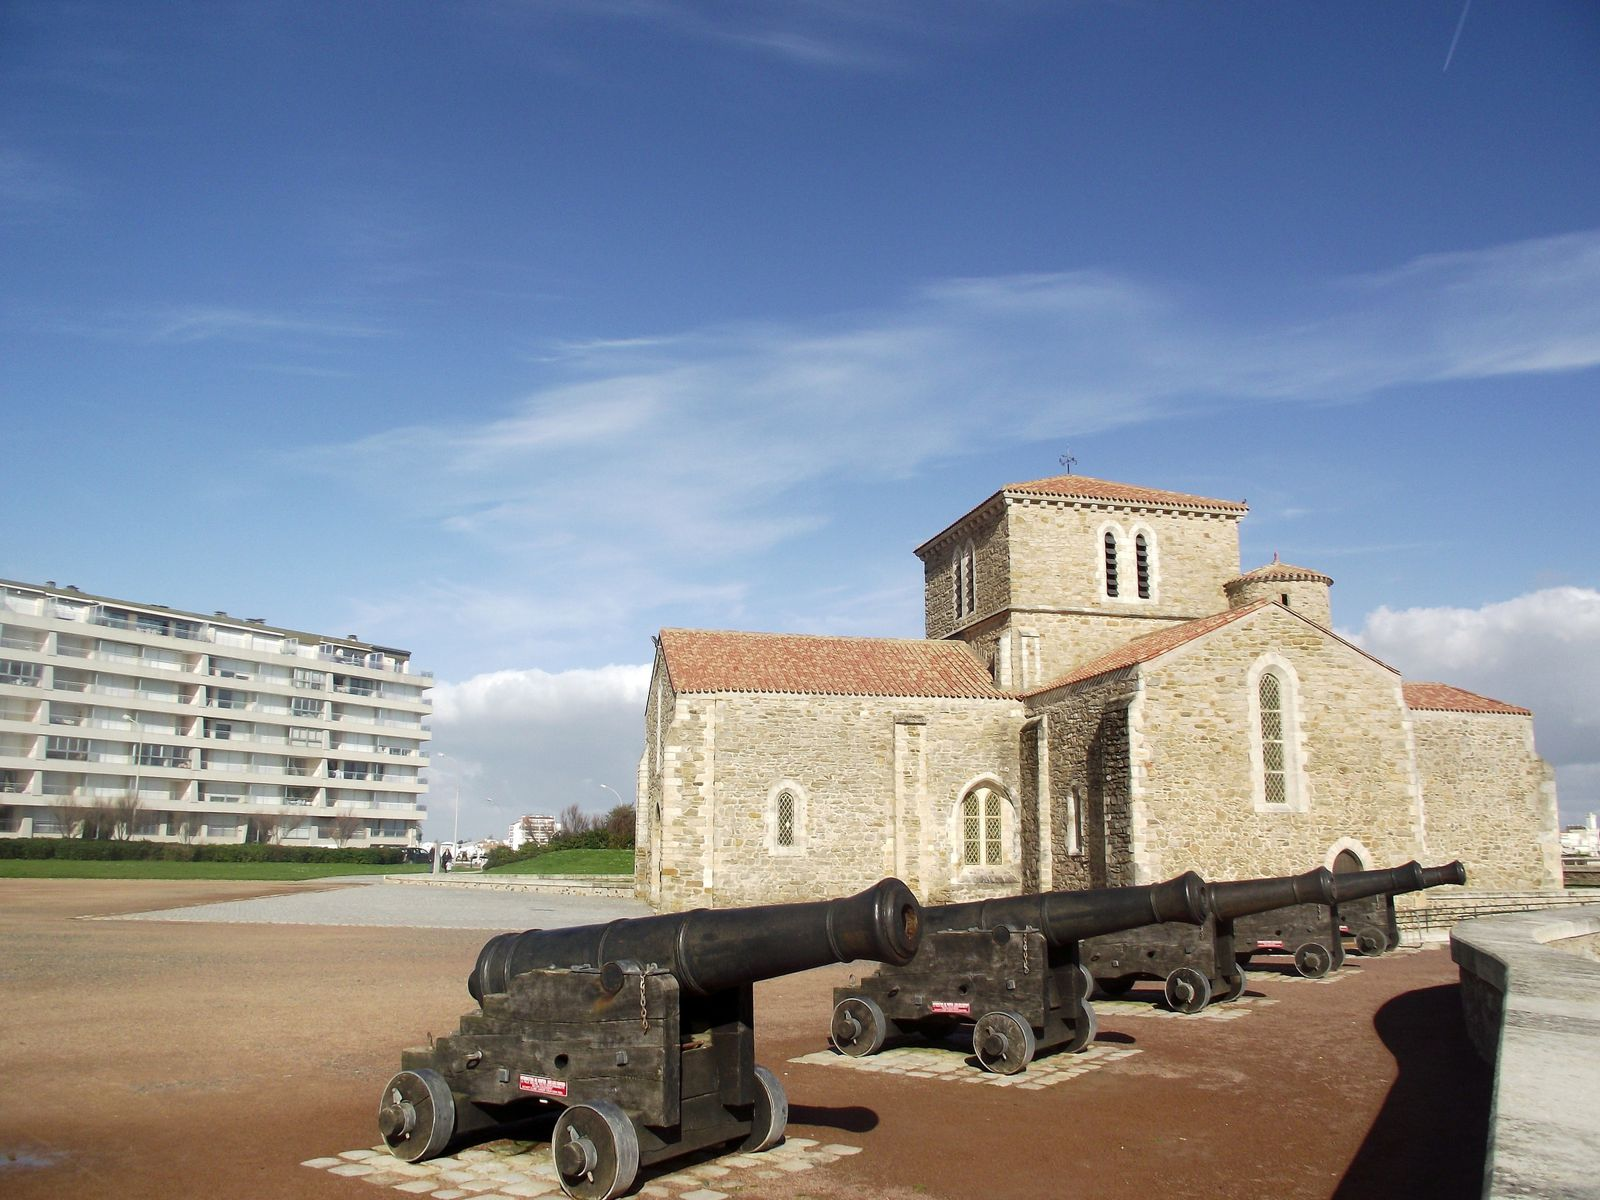 La célèbre station balnéaire vendéenne. Février 2013